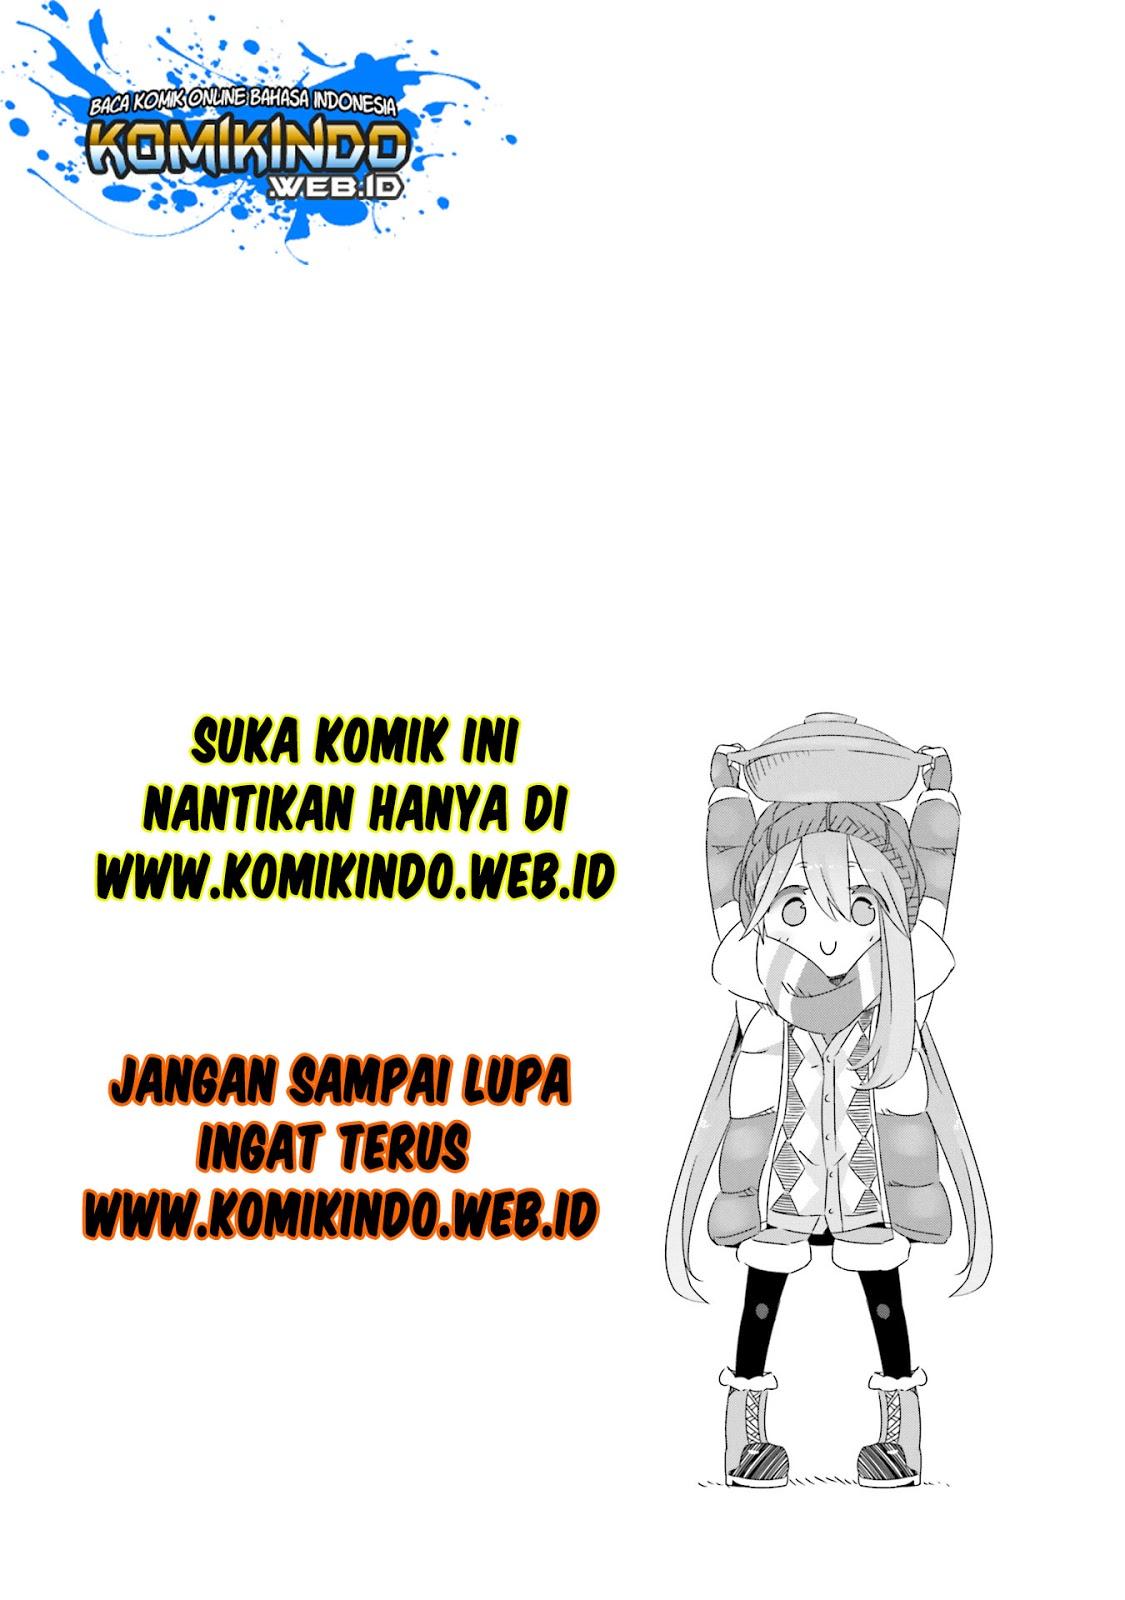 Dilarang COPAS - situs resmi www.mangacanblog.com - Komik yuru camp 012 - chapter 12 13 Indonesia yuru camp 012 - chapter 12 Terbaru 29 Baca Manga Komik Indonesia Mangacan